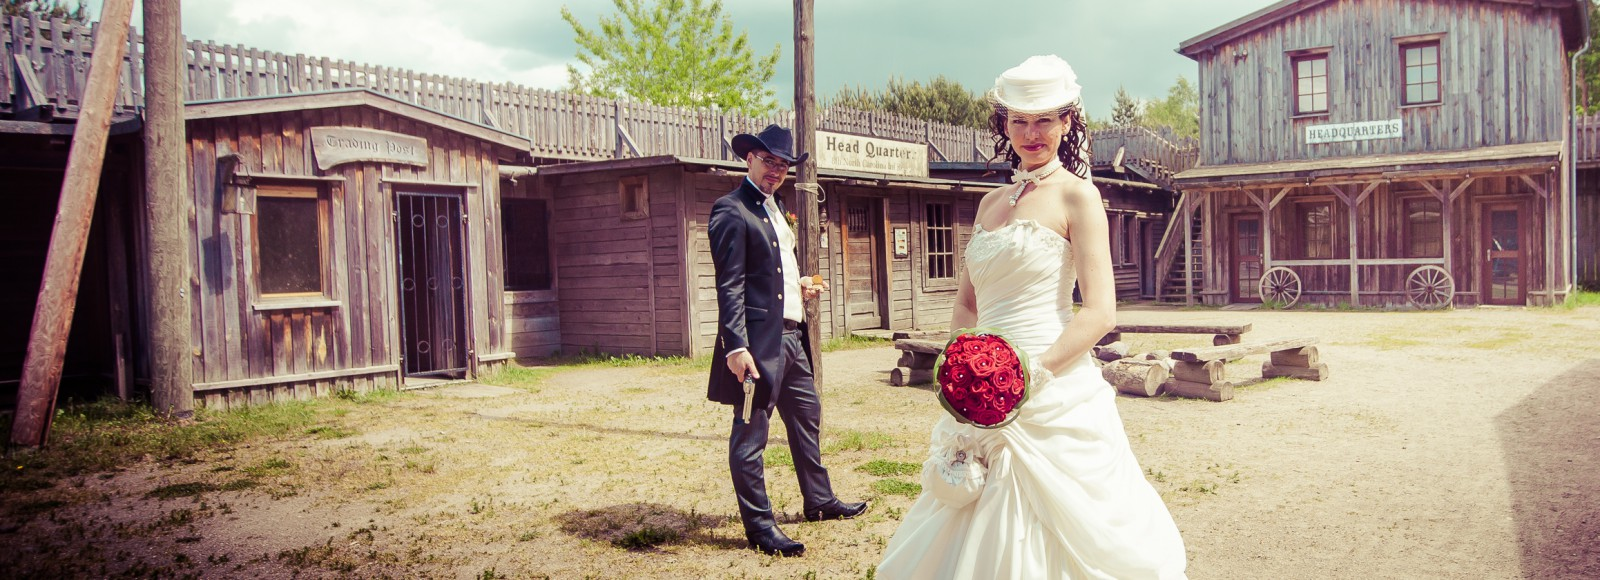 Hochzeitsfotografie-Luptscho.de-01